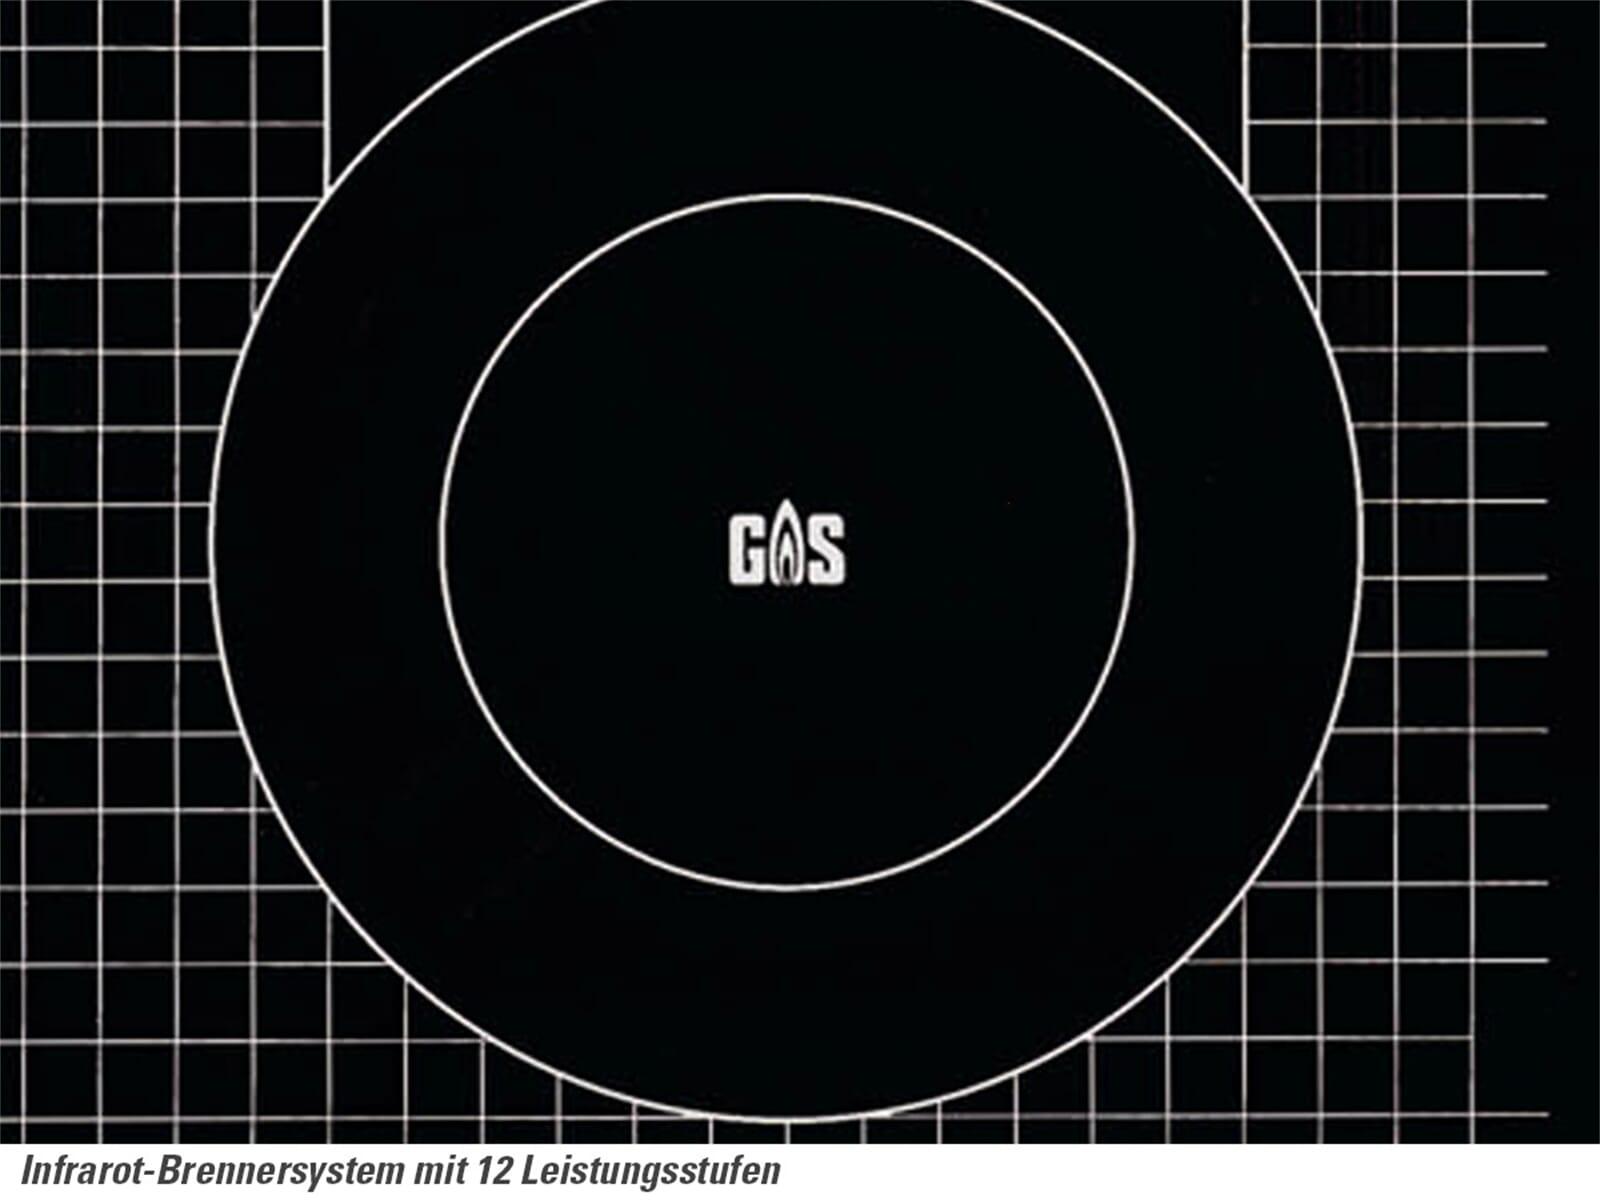 Oranier EKG 2736 - 2736 14 Glaskeramik Gaskochfeld autark